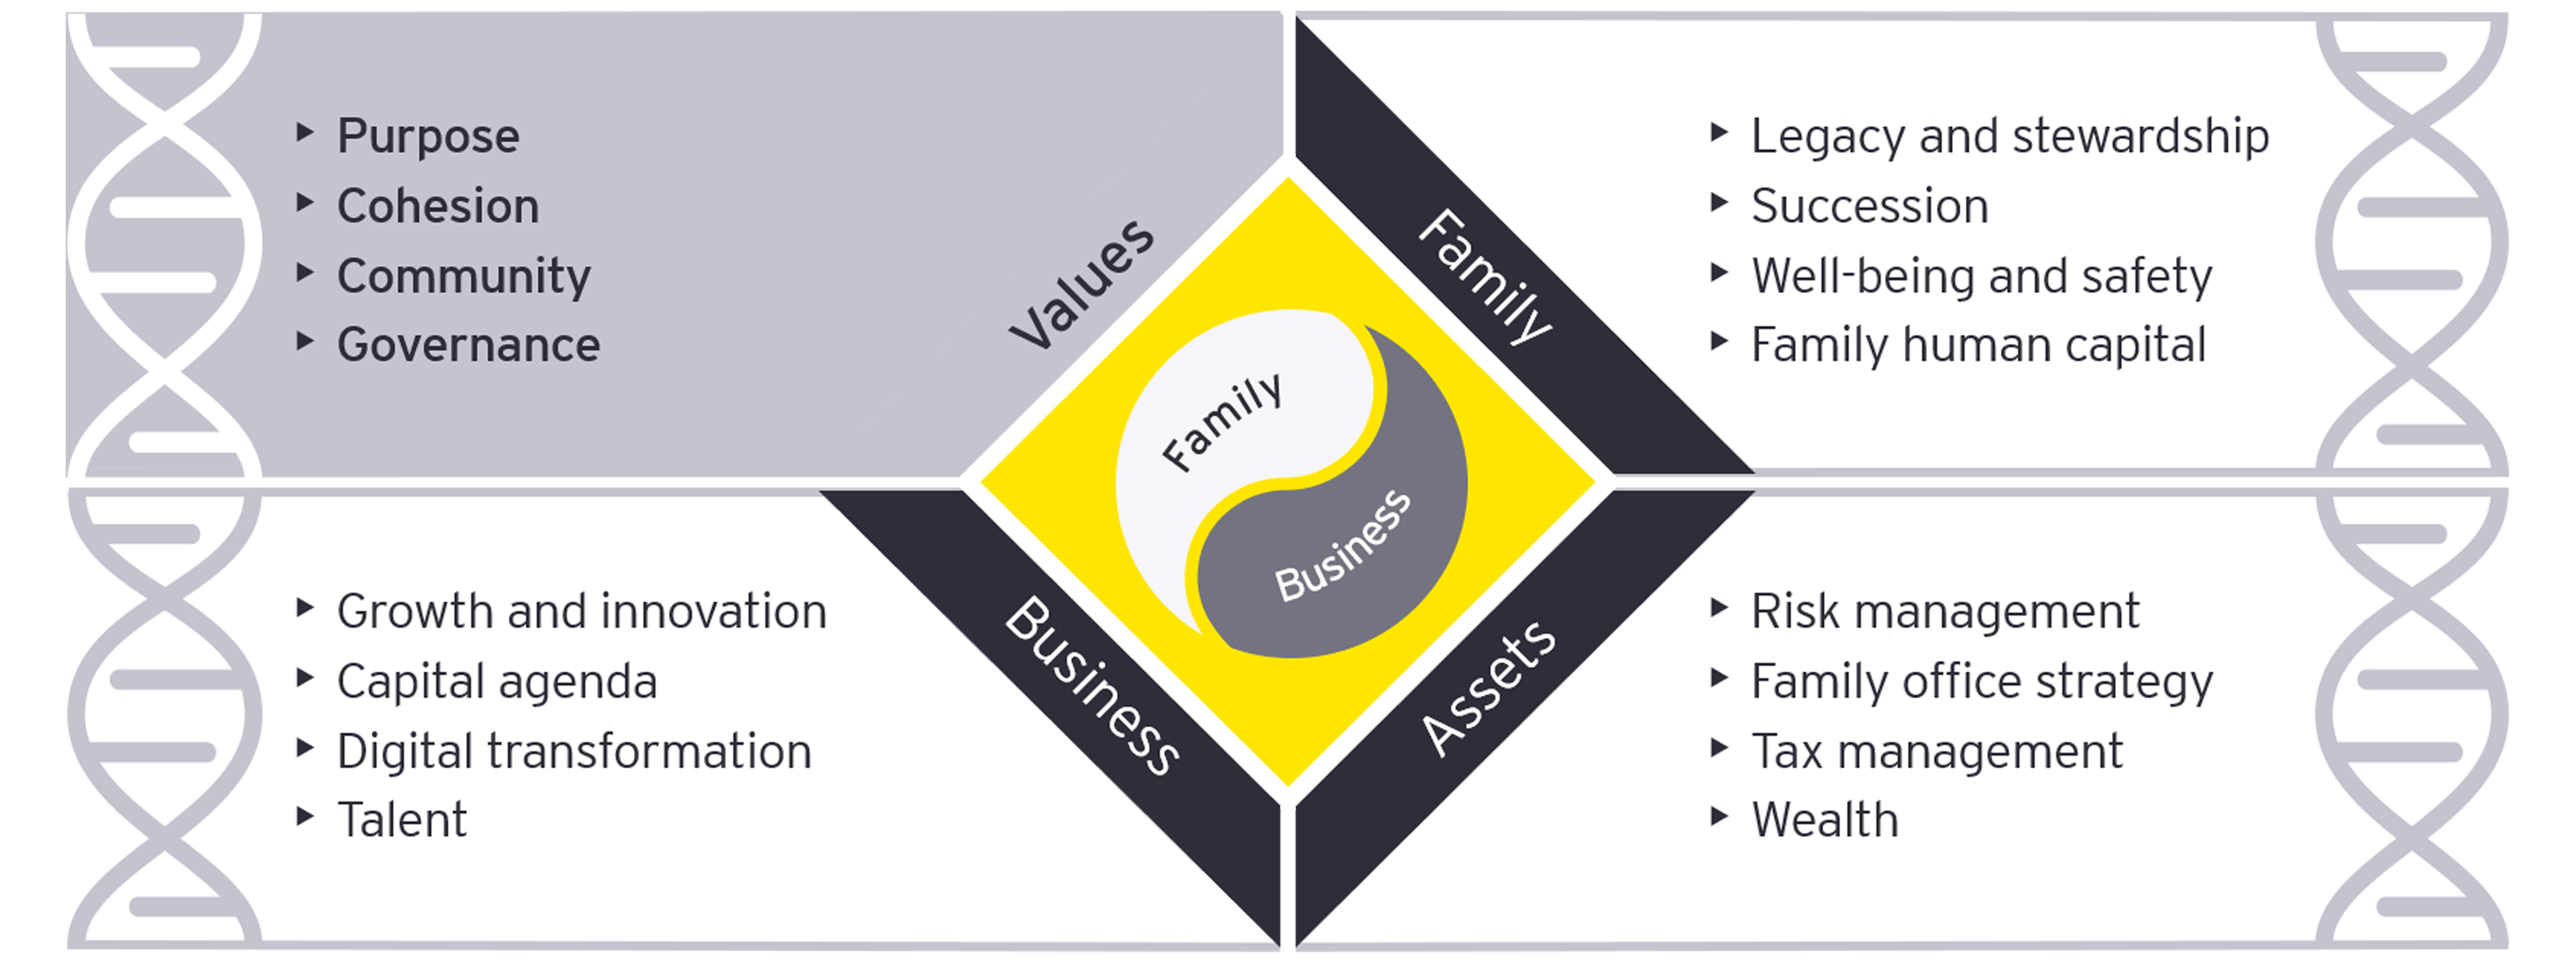 Family enterprise DNA values